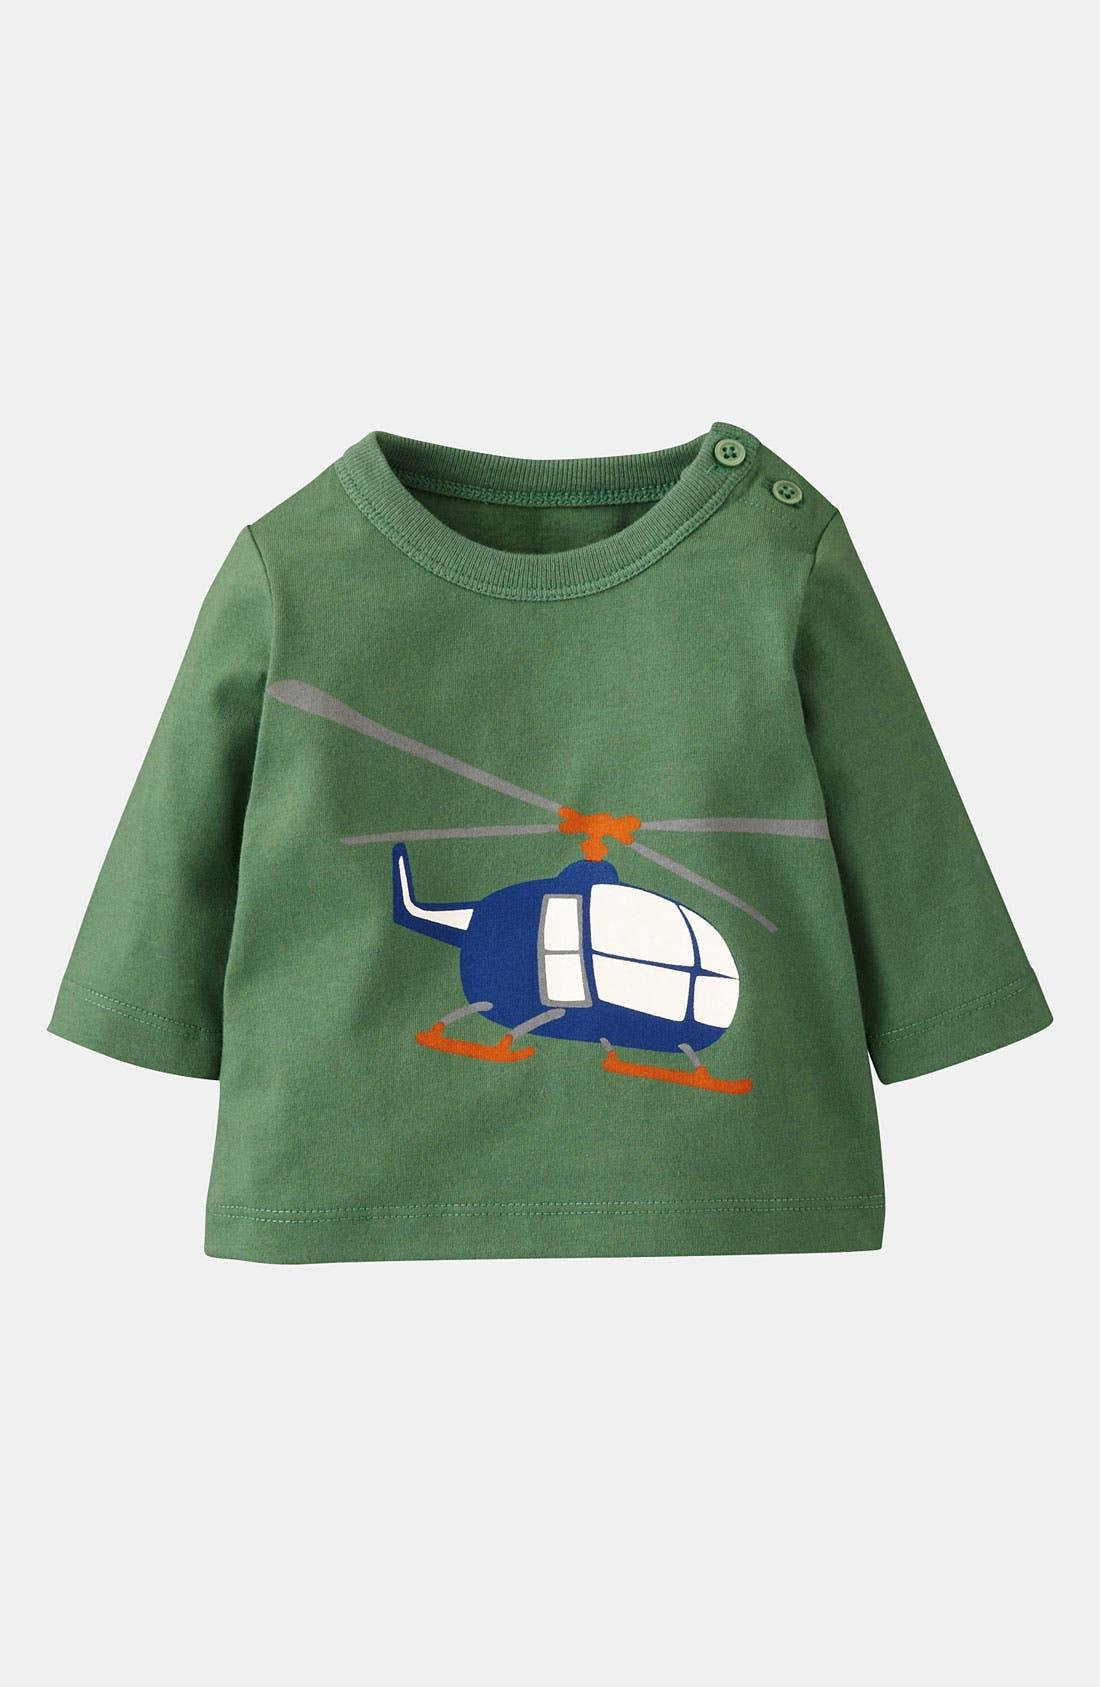 Main Image - Mini Boden 'Vehicle' T-Shirt (Infant)